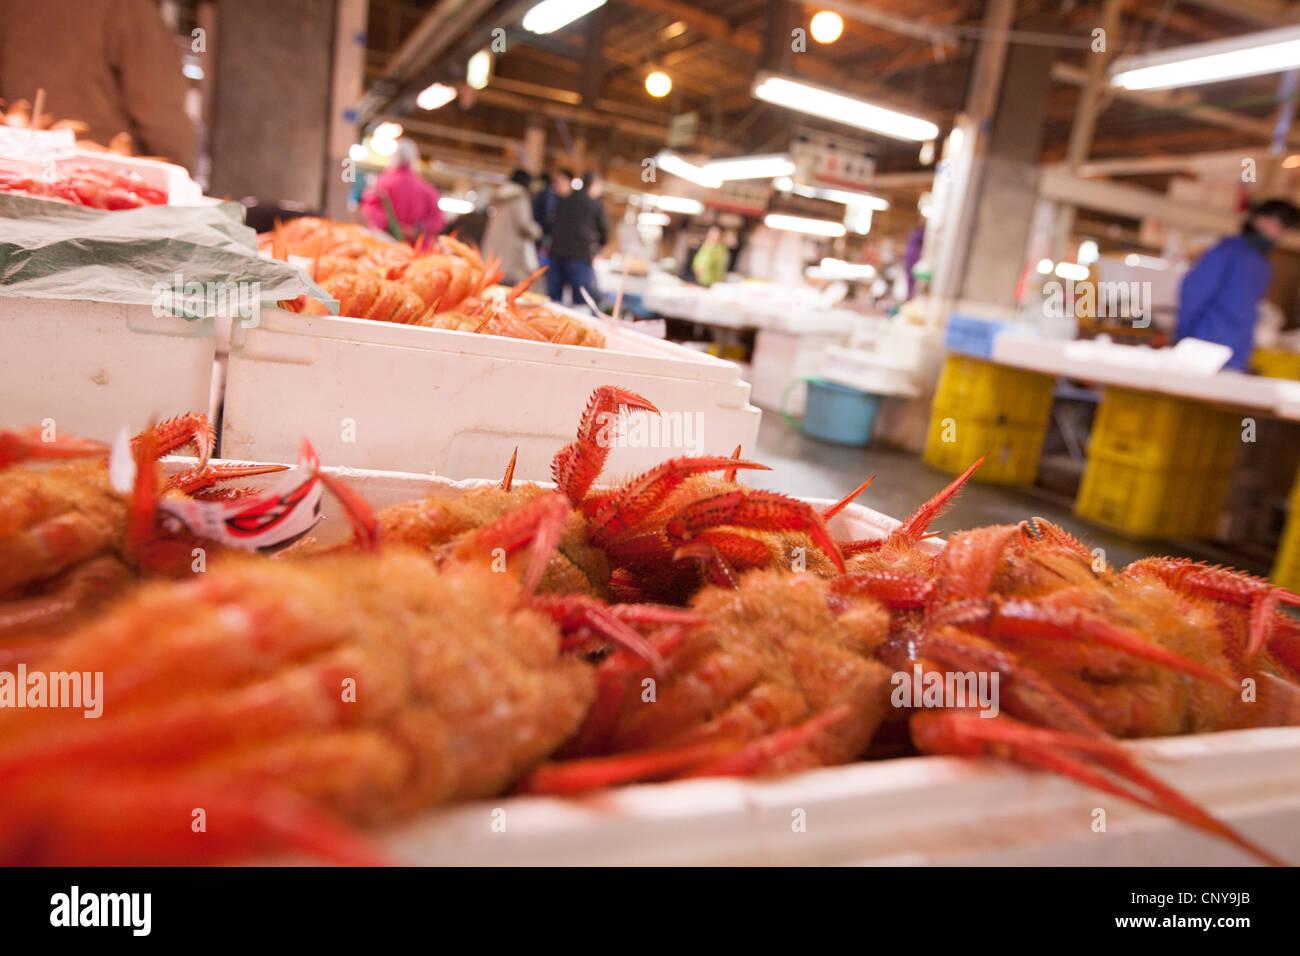 Scenes from inside the Shiogama fish market, in Shiogama town, near Ishinomaki, on the Miyagi coastline of Japan Stock Photo